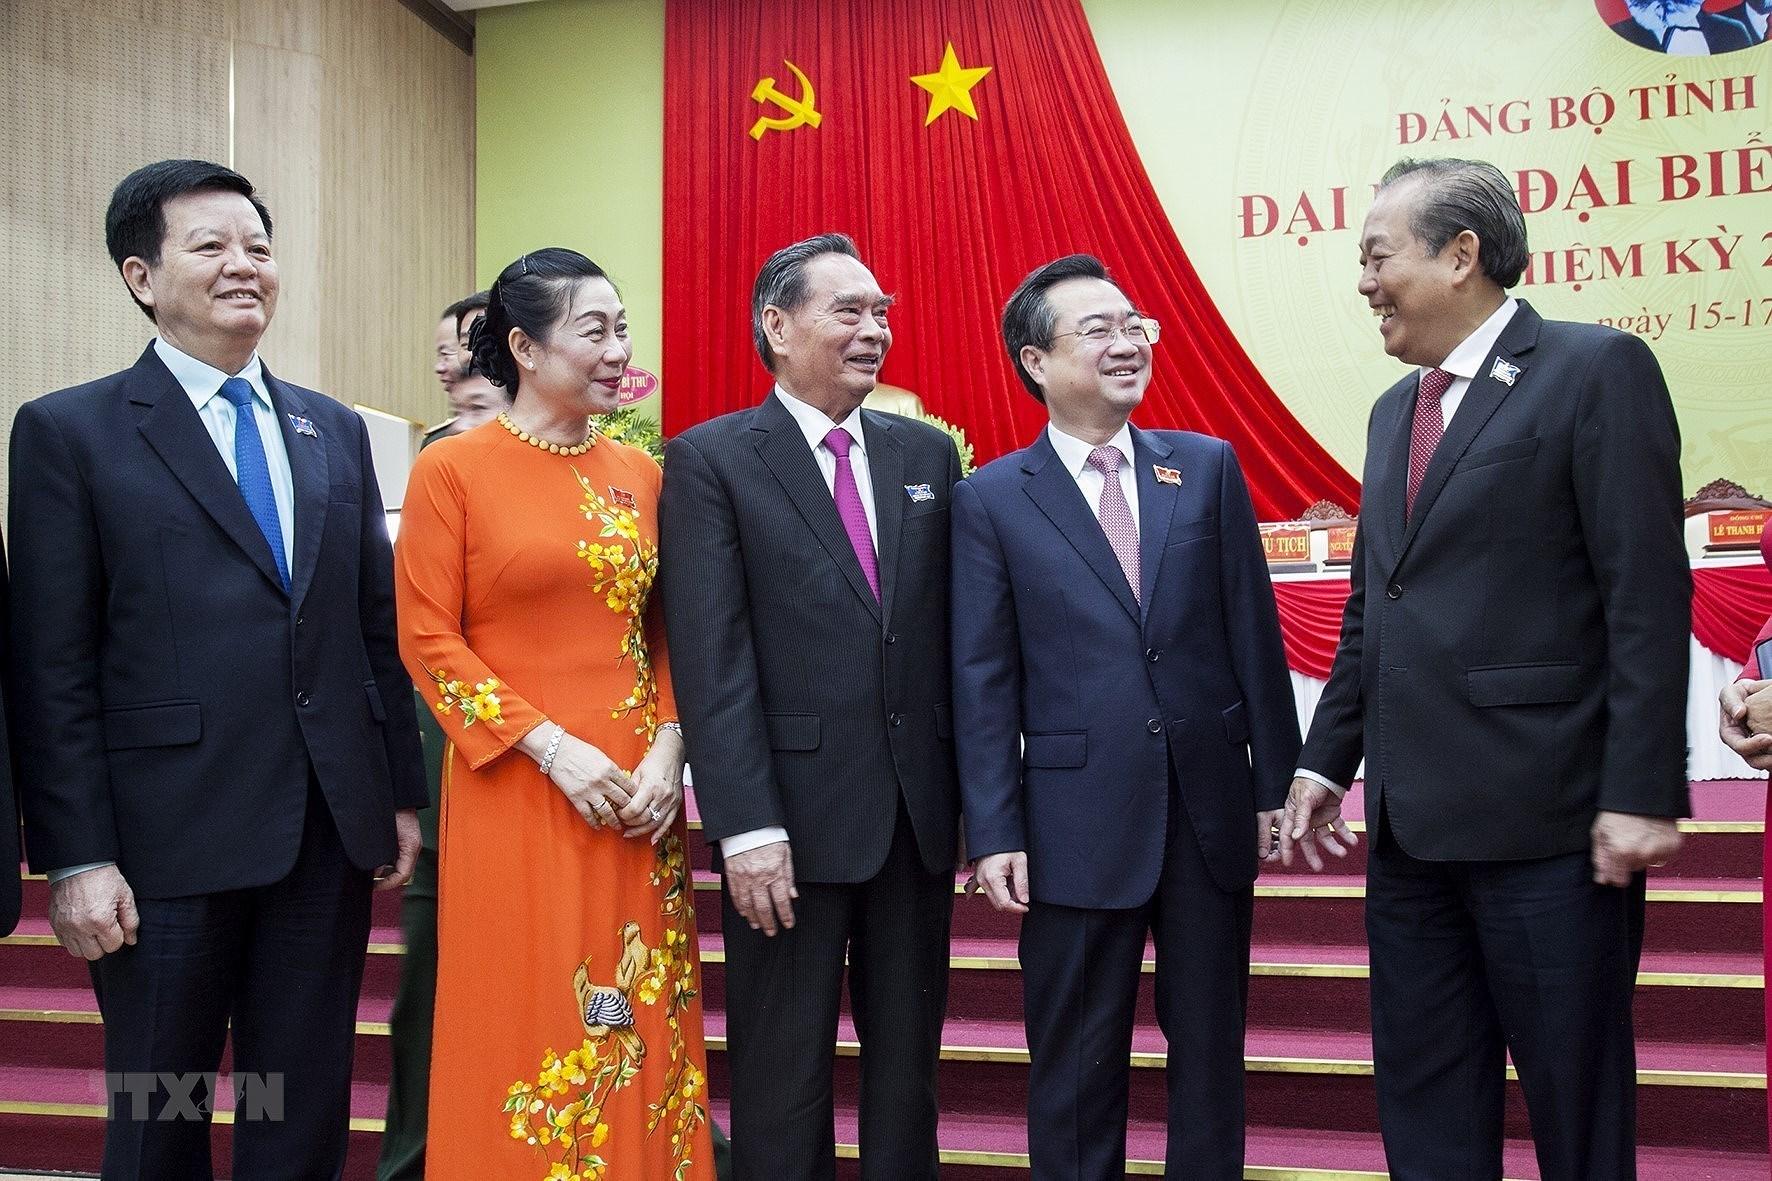 Khai mac Dai hoi Dang bo tinh Kien Giang lan XI nhiem ky 2020-2025 hinh anh 5